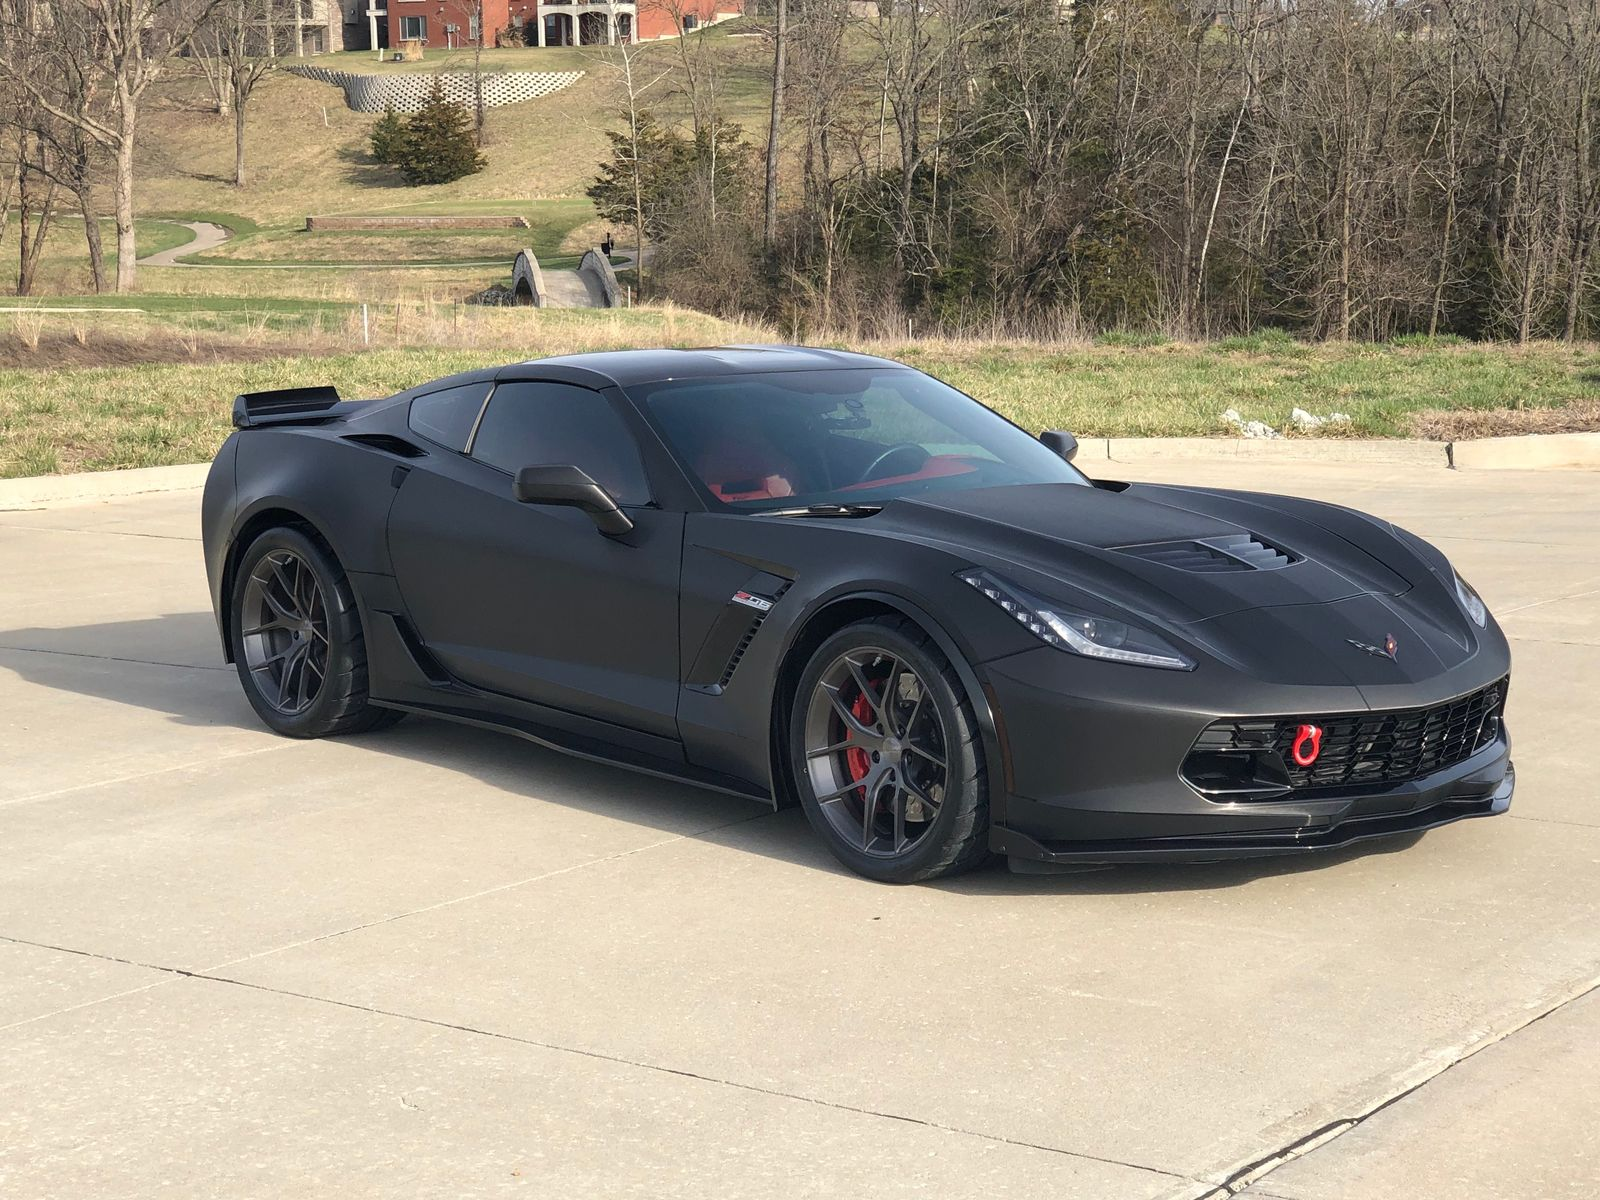 2018 Chevrolet Corvette Z06 | Steve Dalbec's C7 Corvette Z06 on Forgeline One Piece Forged Monoblock VX1 Wheels